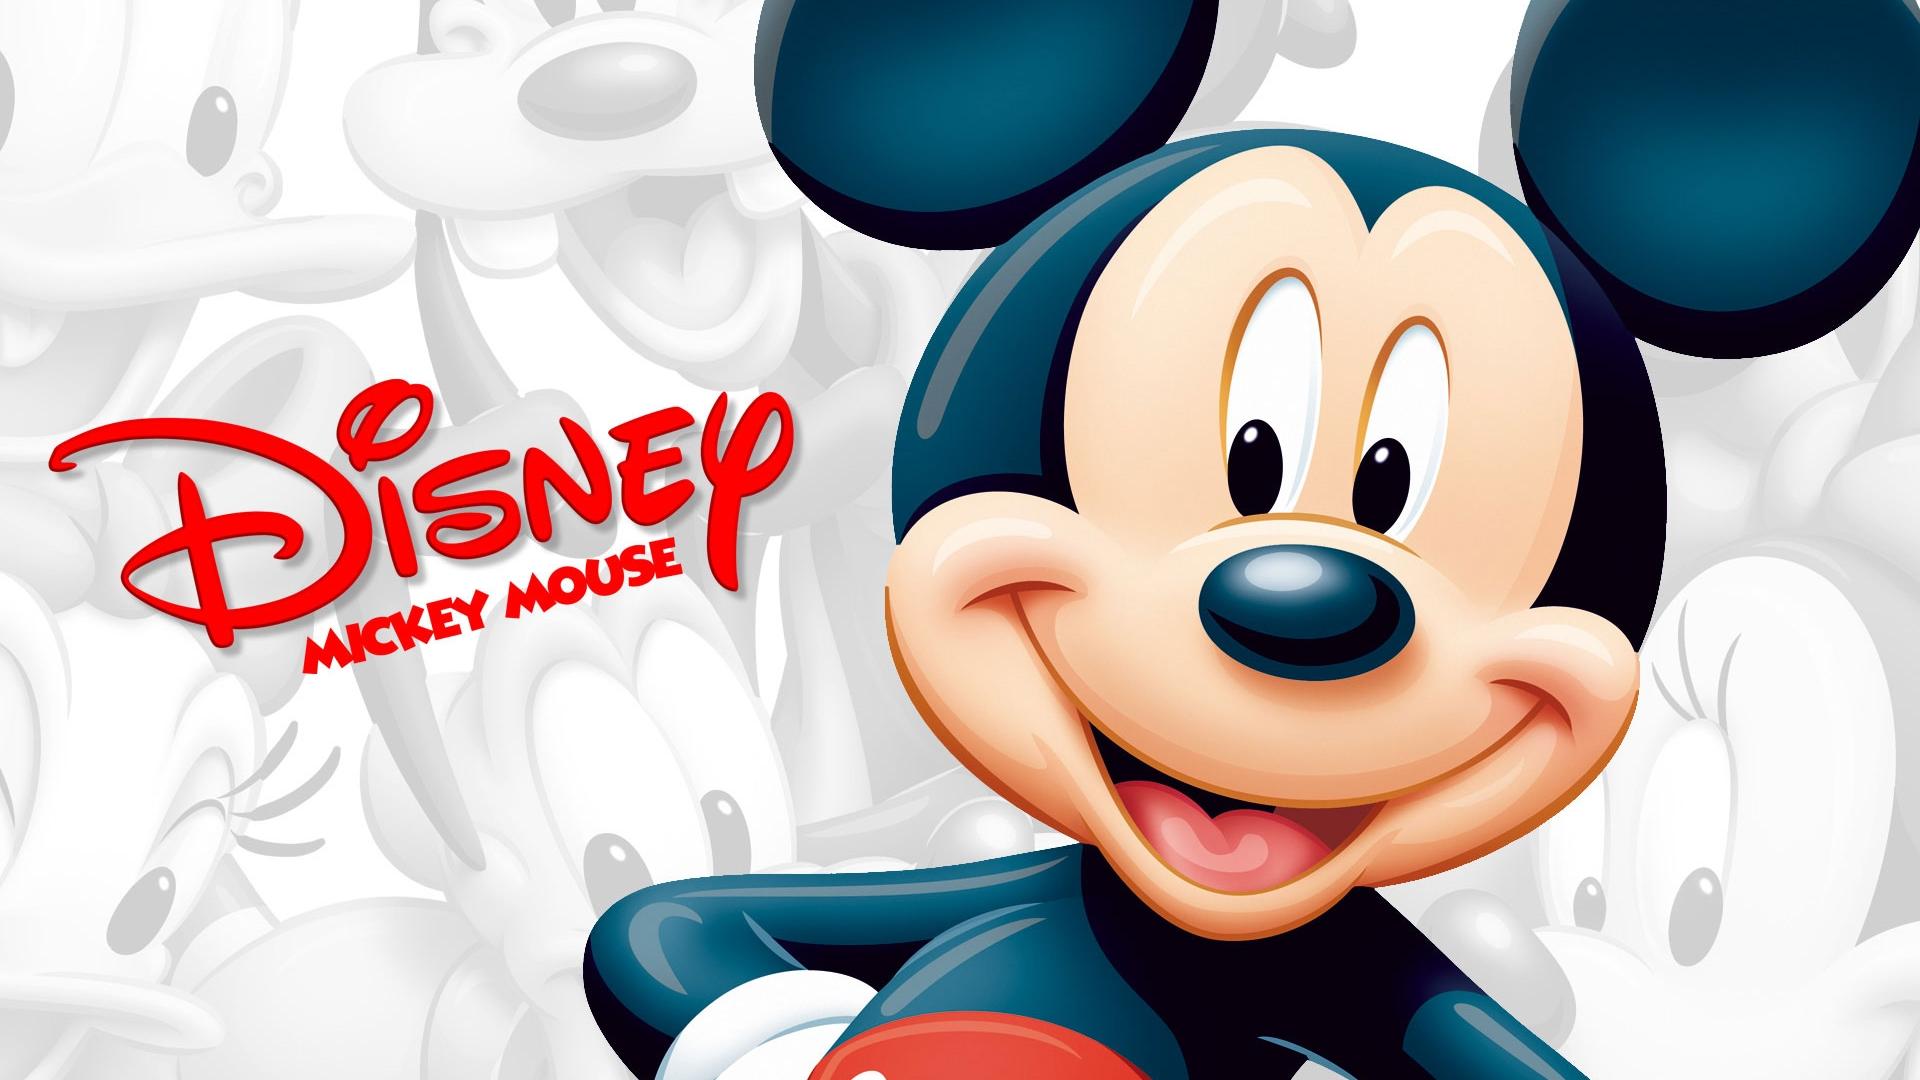 Disney Desktop Backgrounds Widescreen 1920x1080